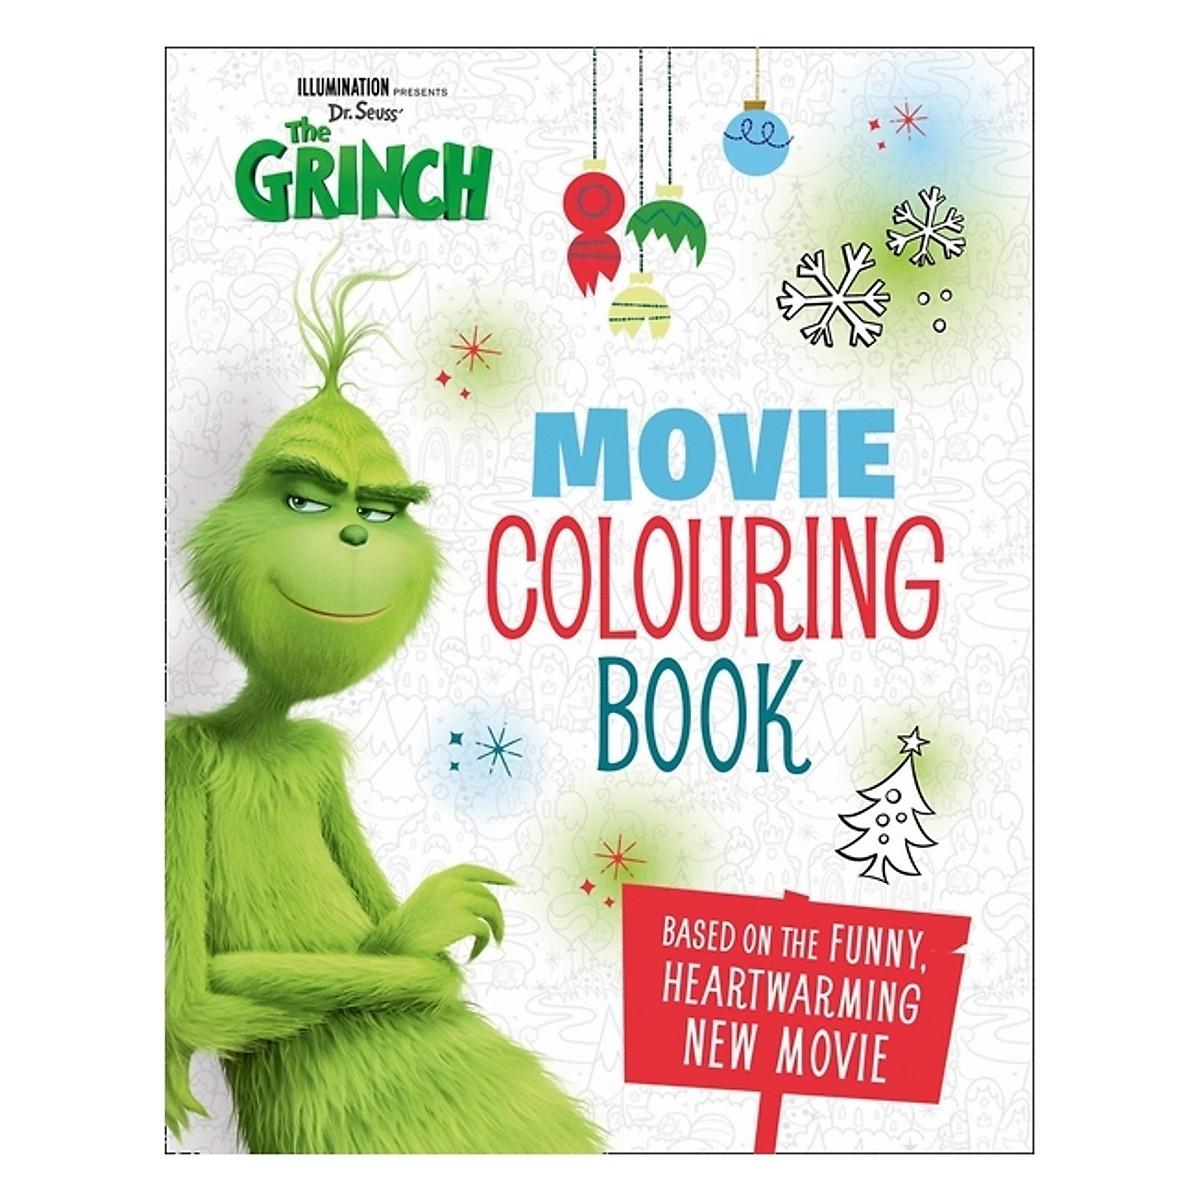 Hình đại diện sản phẩm The Grinch: Movie Colouring Book: Movie Tie-in